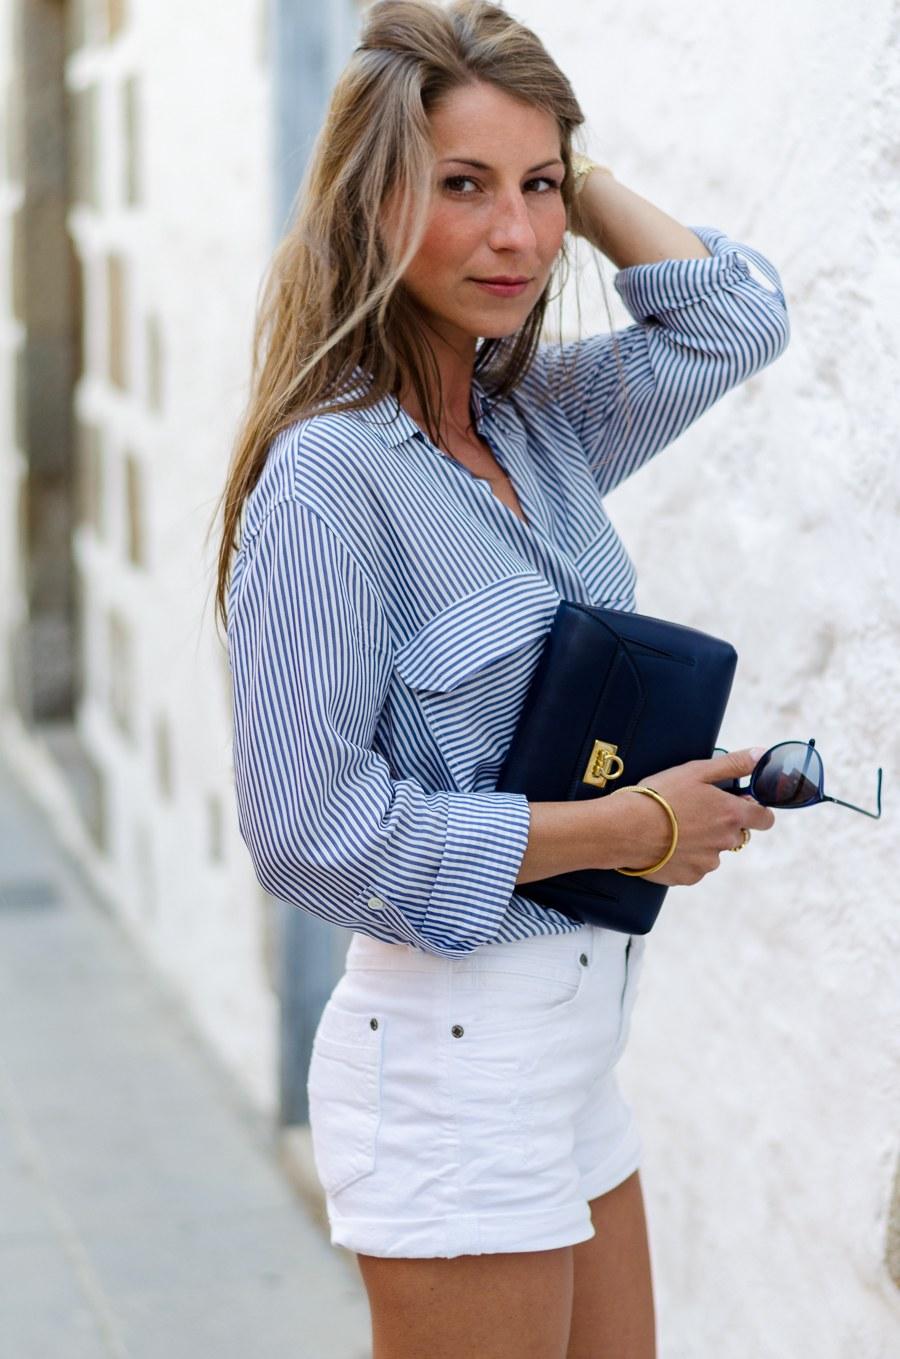 summer outfit bluse mit streifen wei e jeans shorts v j du modeblog aus deutschland. Black Bedroom Furniture Sets. Home Design Ideas